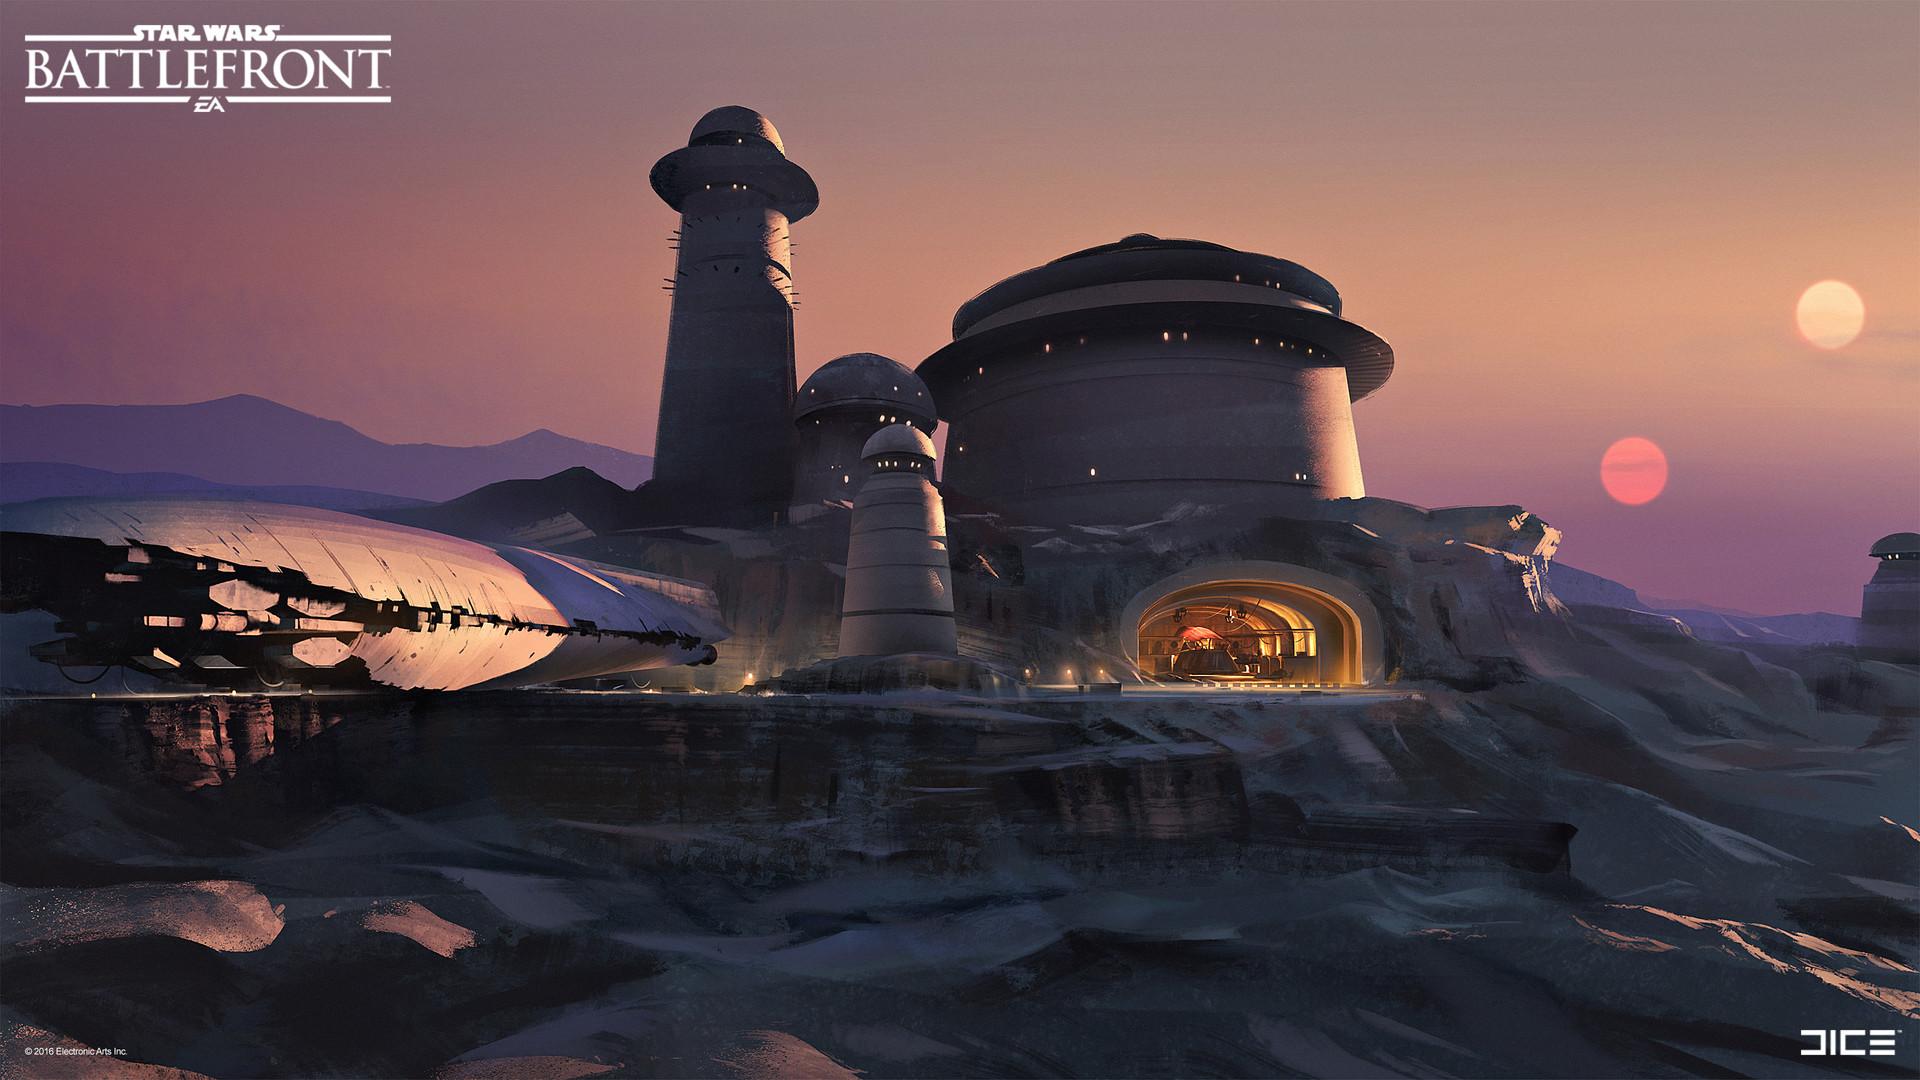 Star Wars Battlefront Concept Art